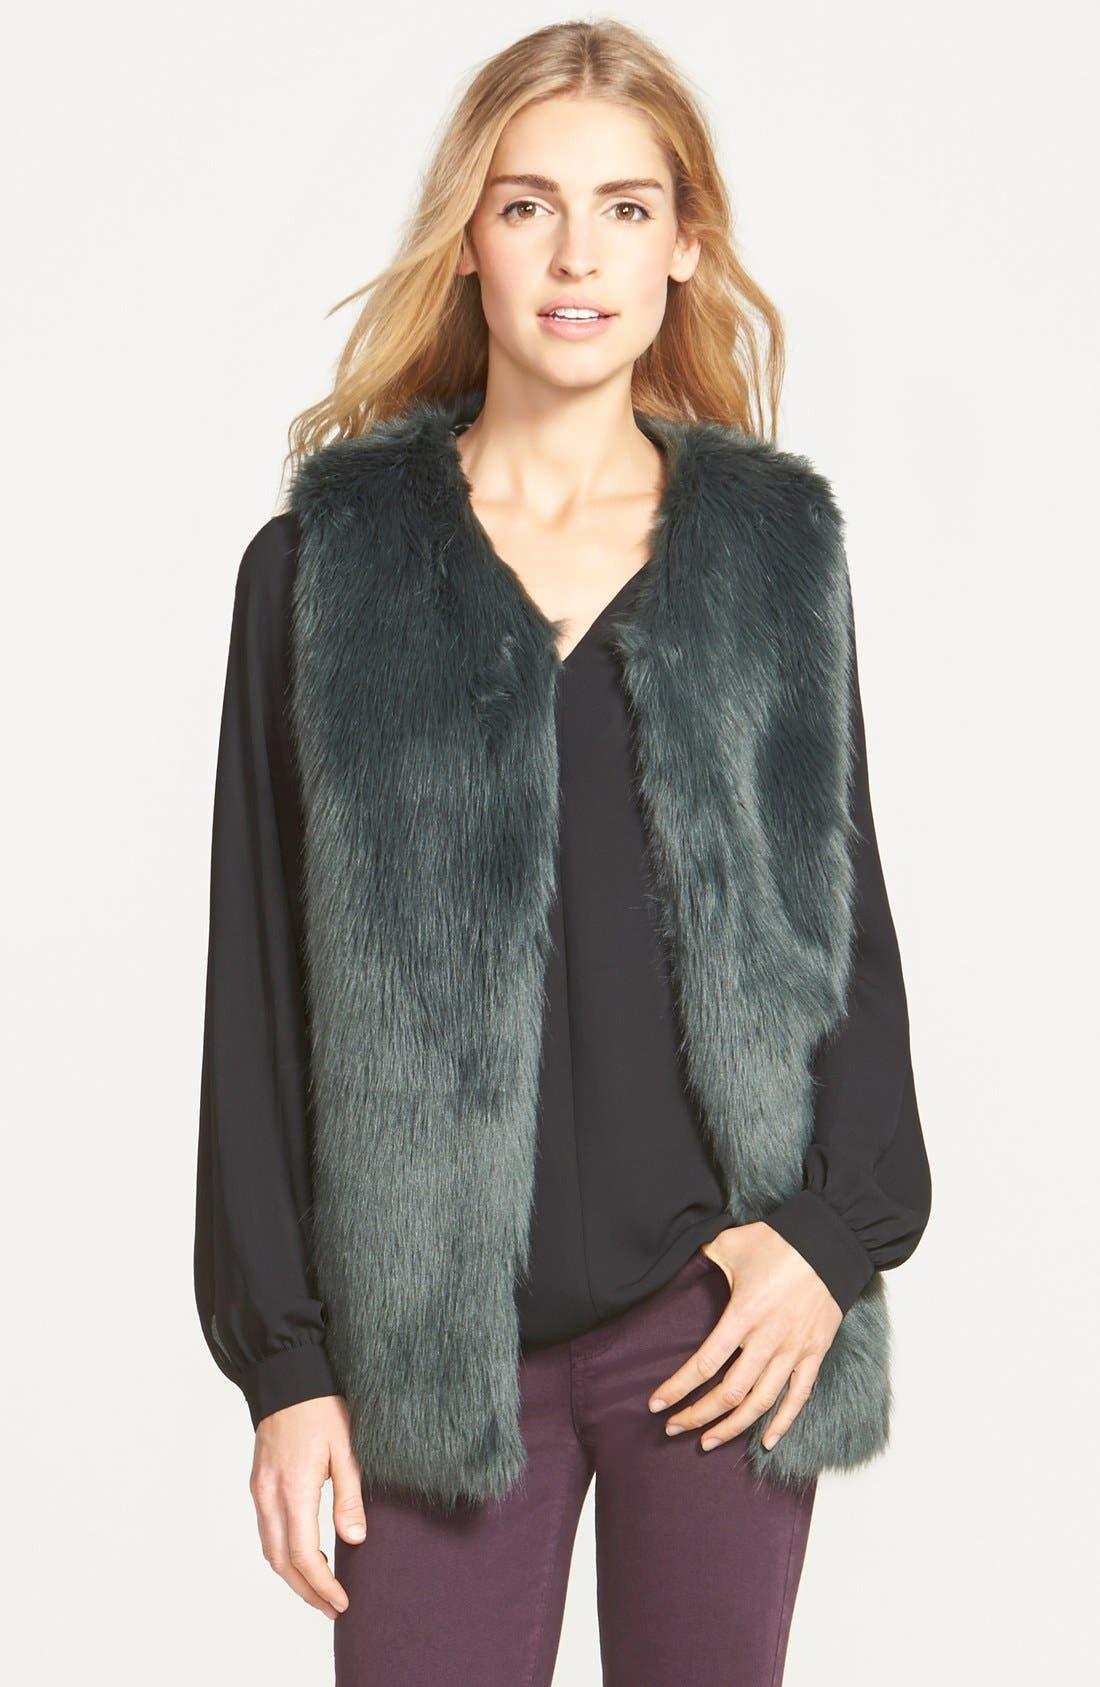 Alternate Image 1 Selected - Laundry by Design Faux Fur Vest